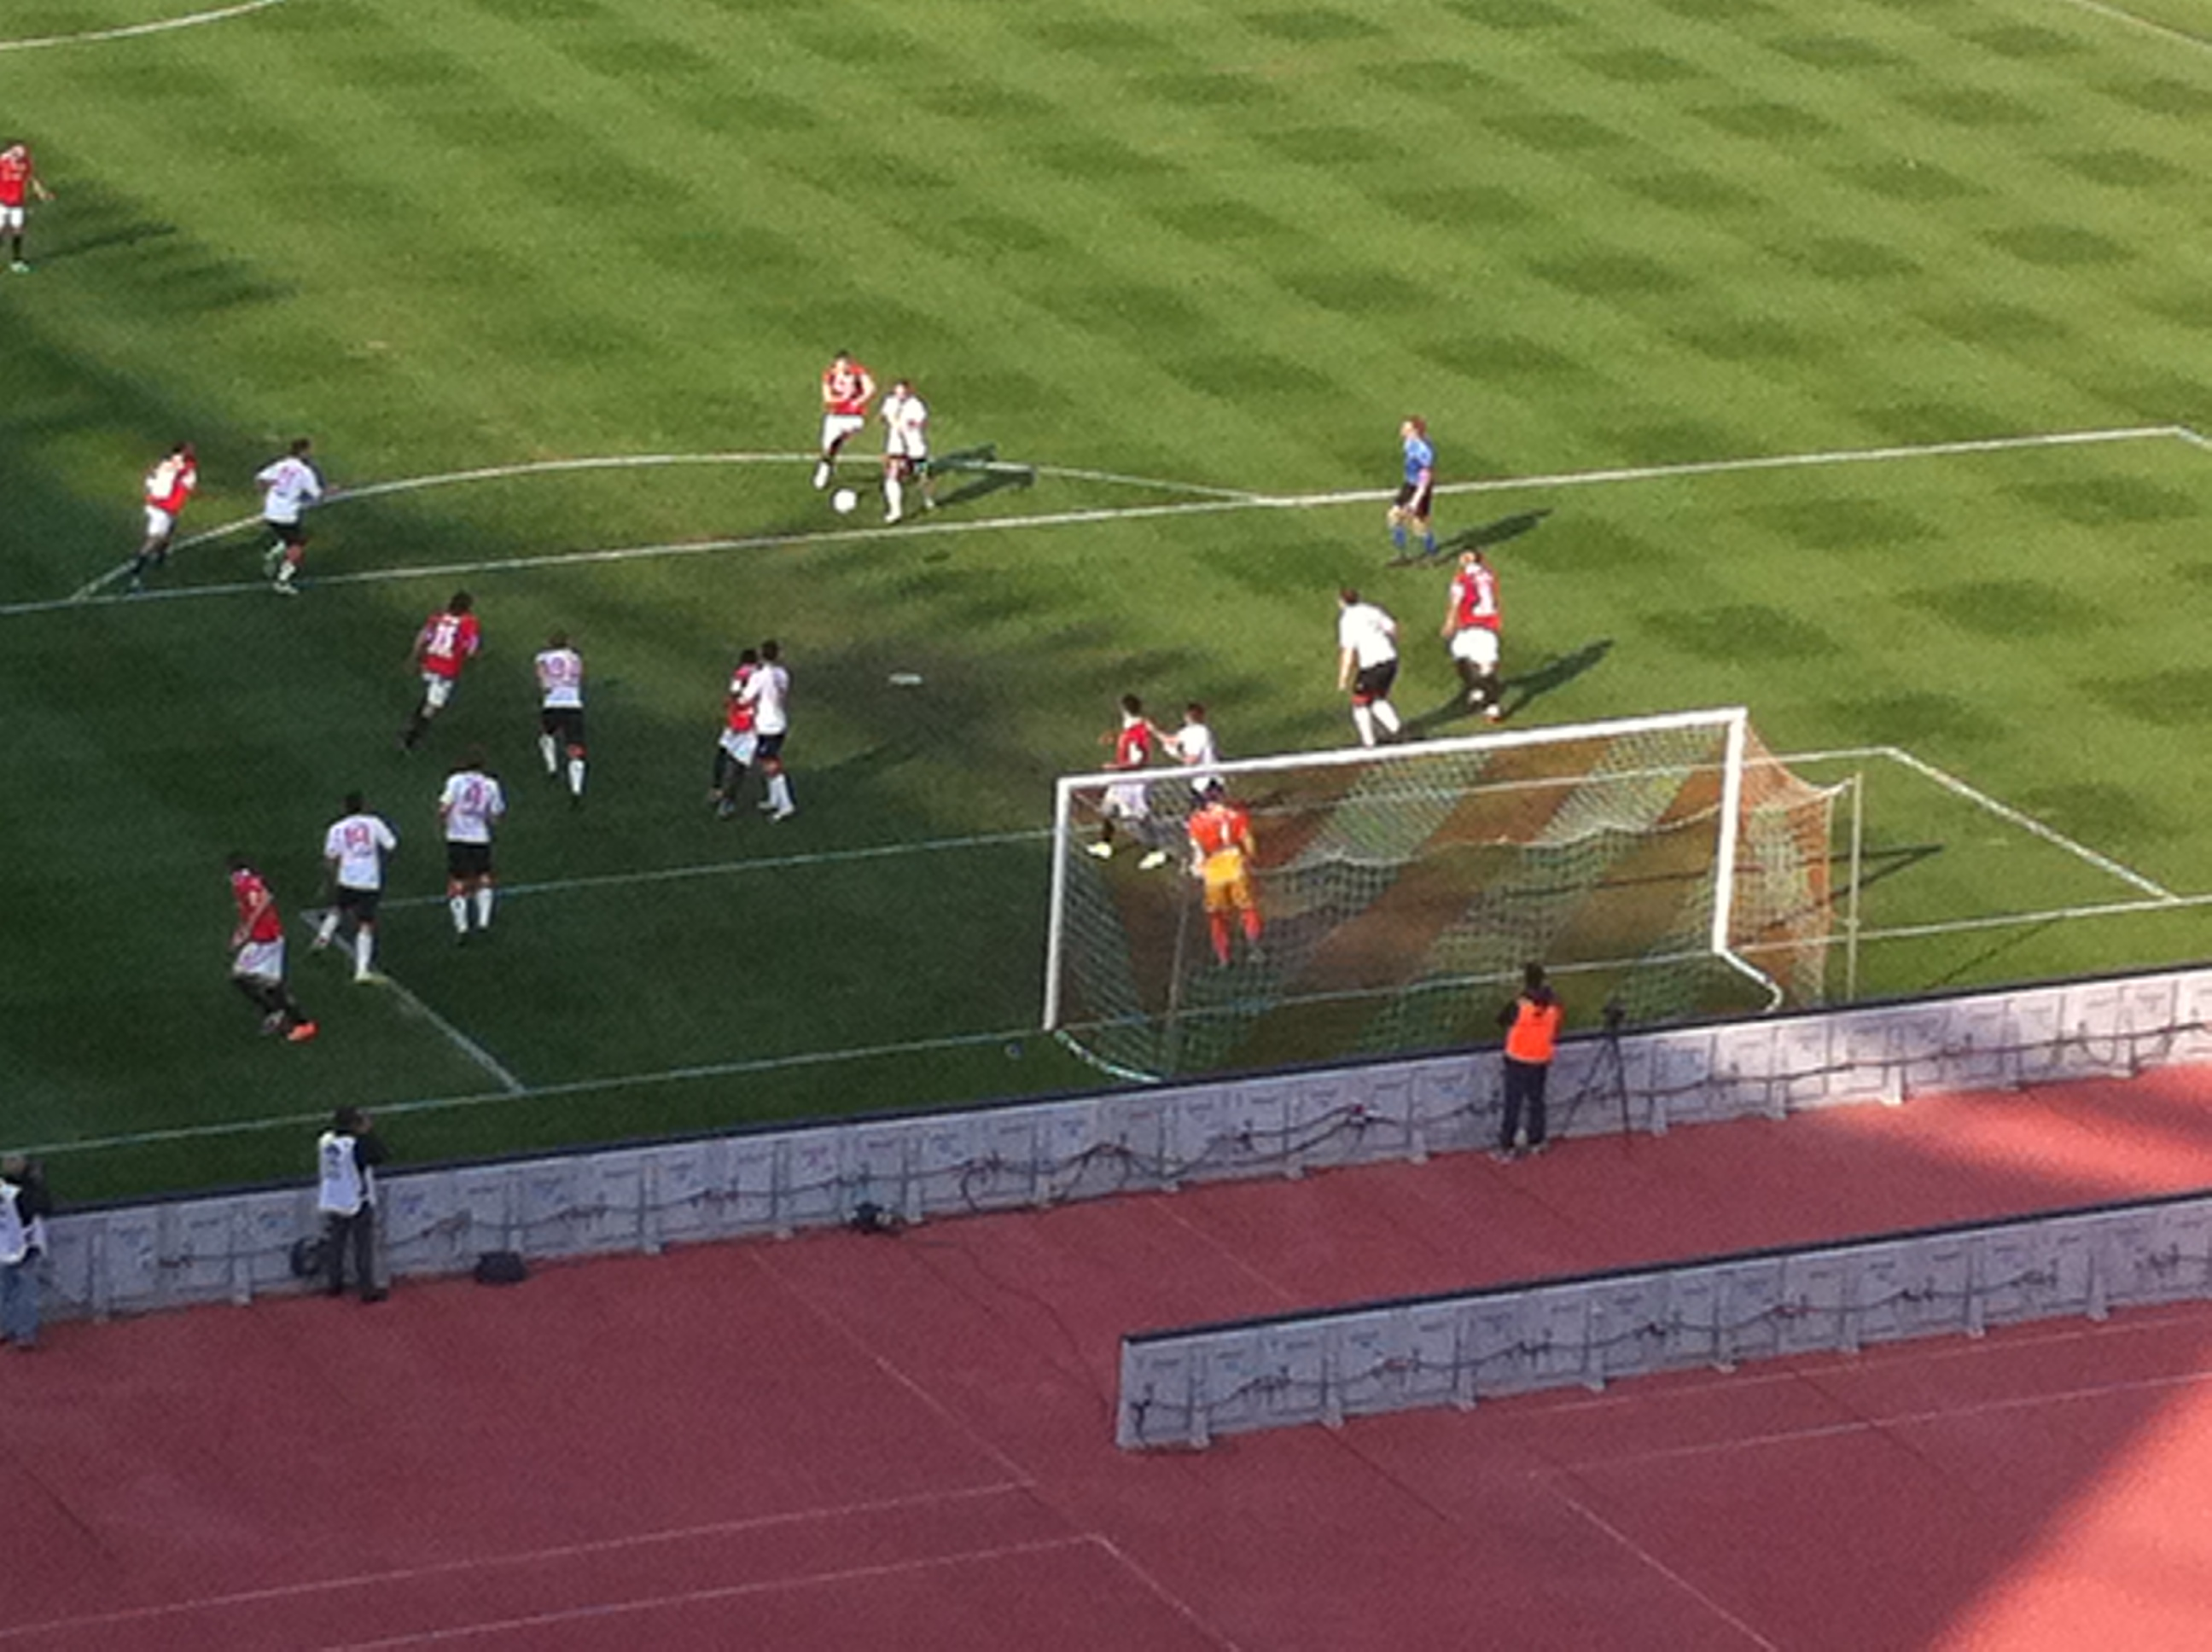 Calcio: Bari-Varese 3-0